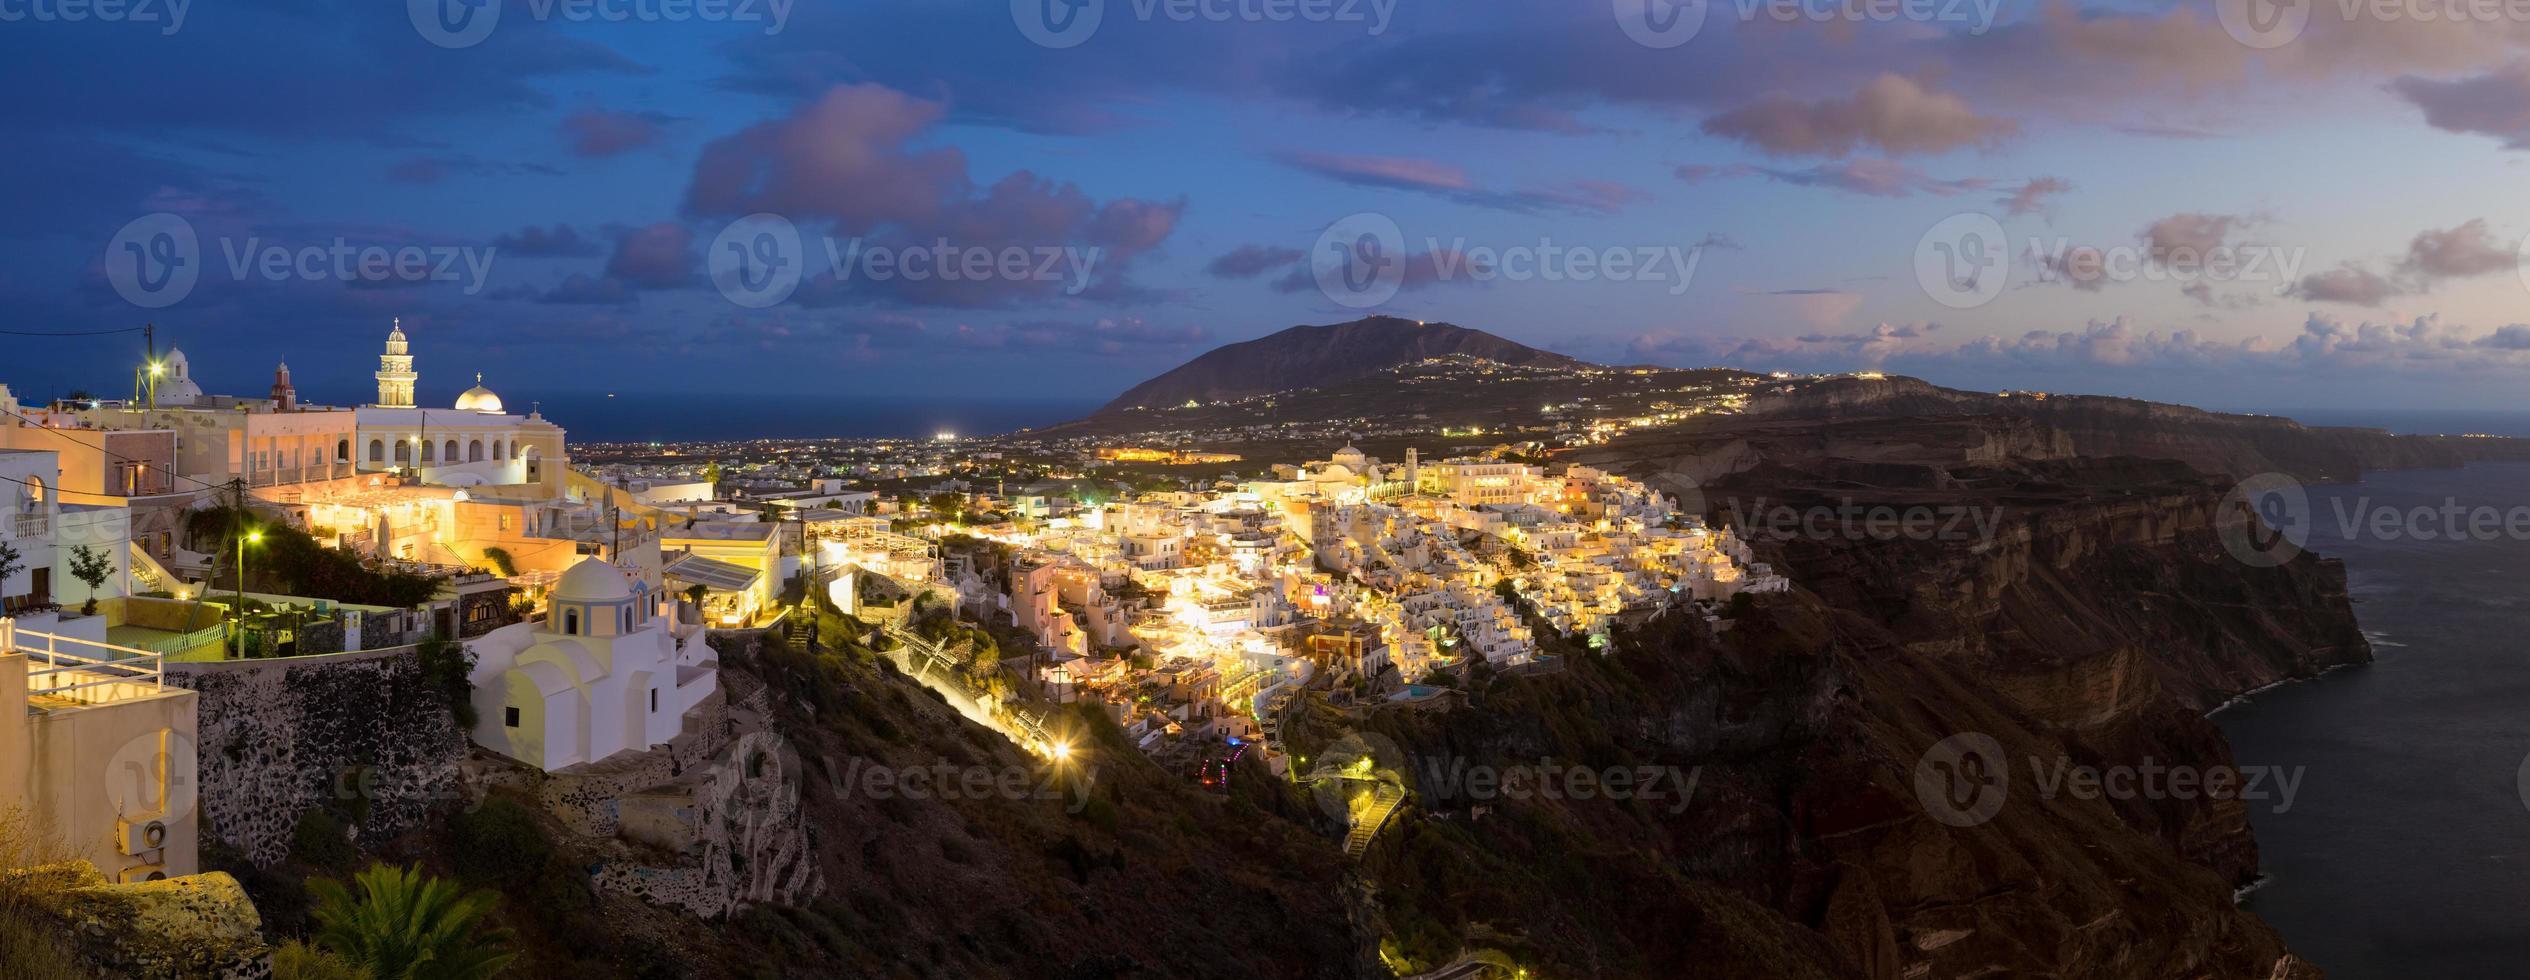 Thira, Santorini, Griechenland. foto